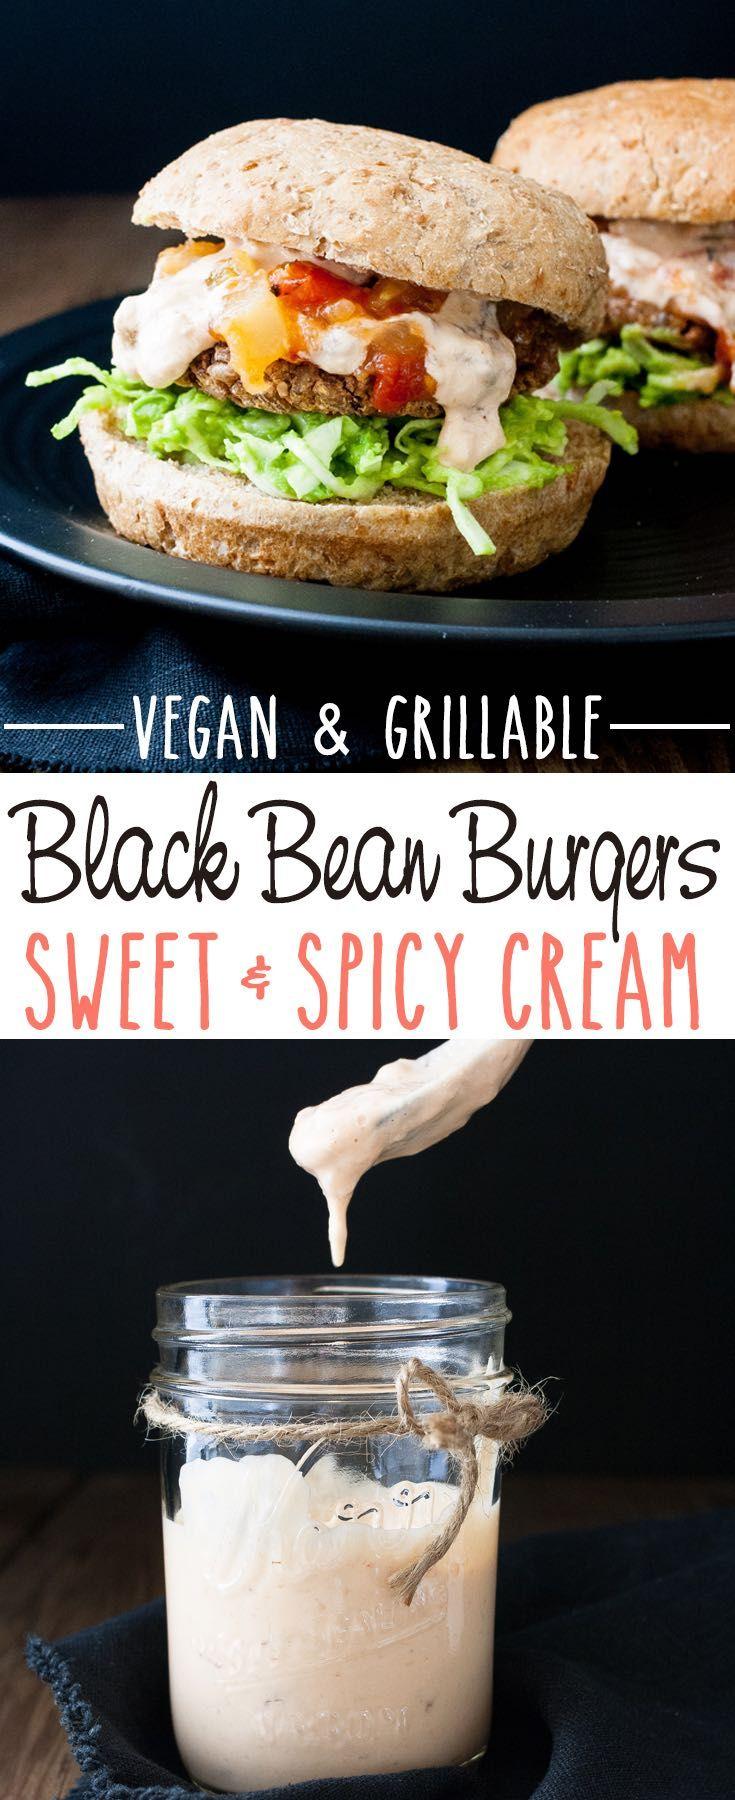 Easy Grillable Sweet and Spicy Vegan Black Bean Burgers with Mango Habanero Cream | www.veggiesdontbite.com |